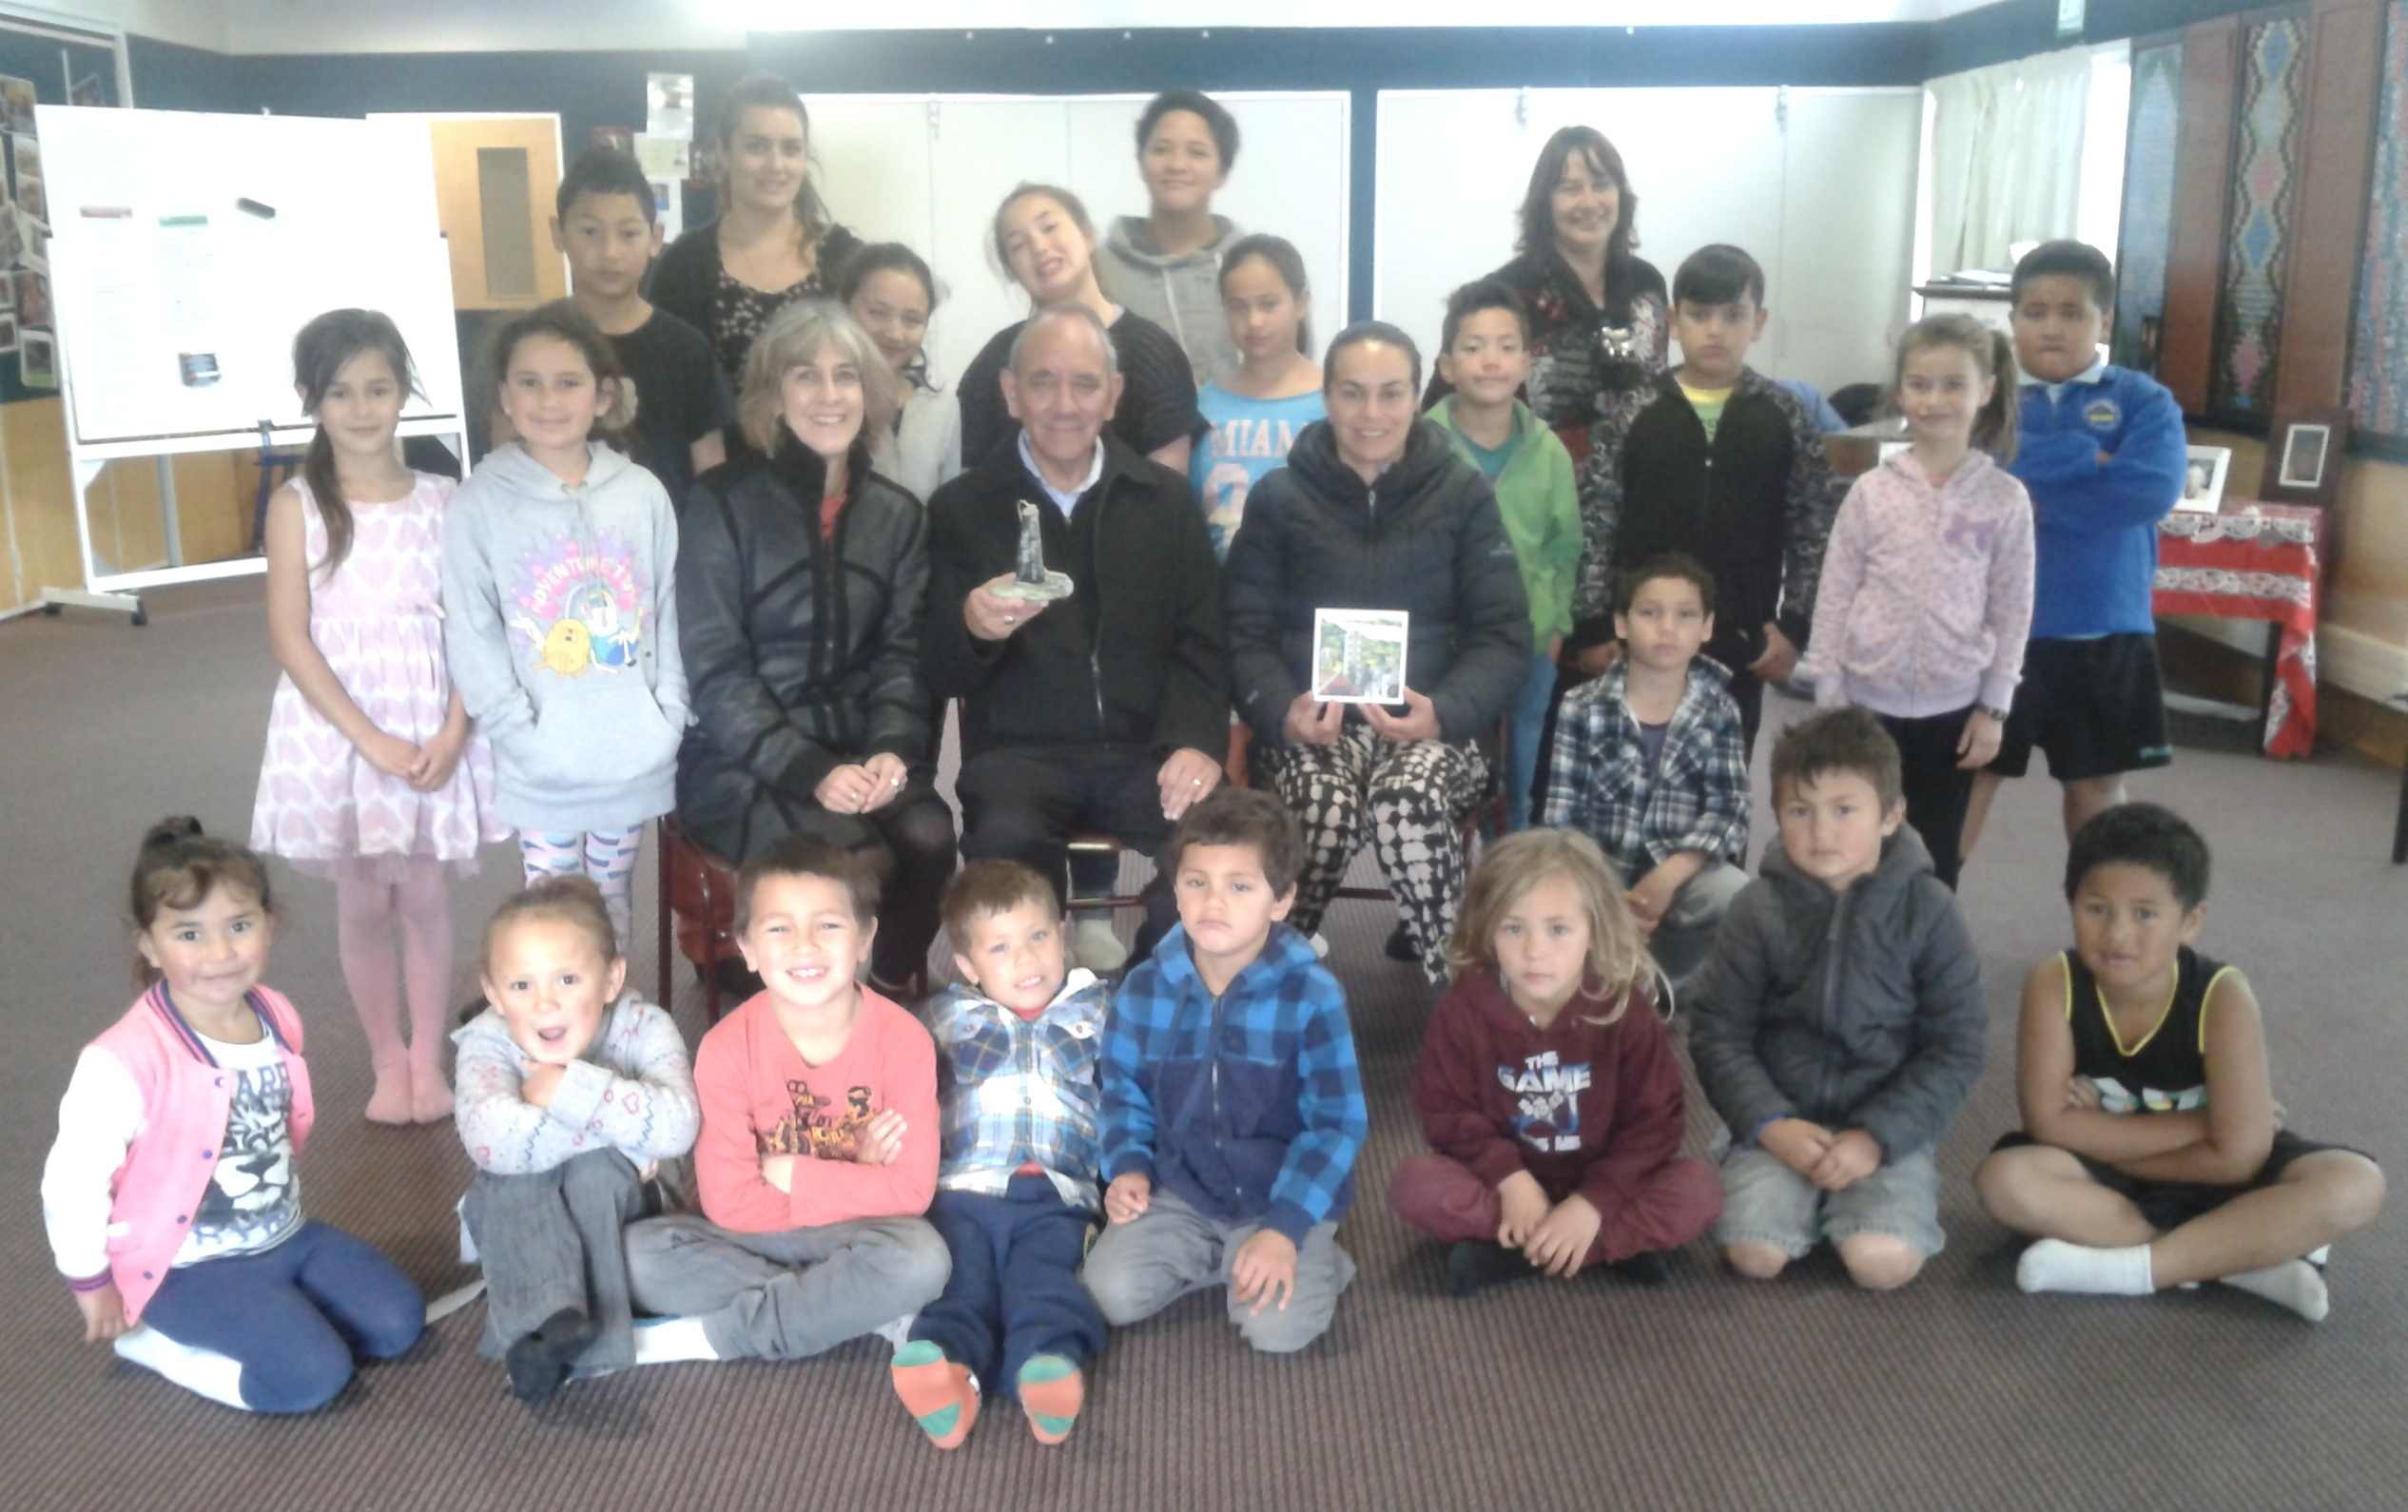 Tama Smith and Katharina Ruckstuhl with teachers and pupils at presentation of the taonga pounamu.